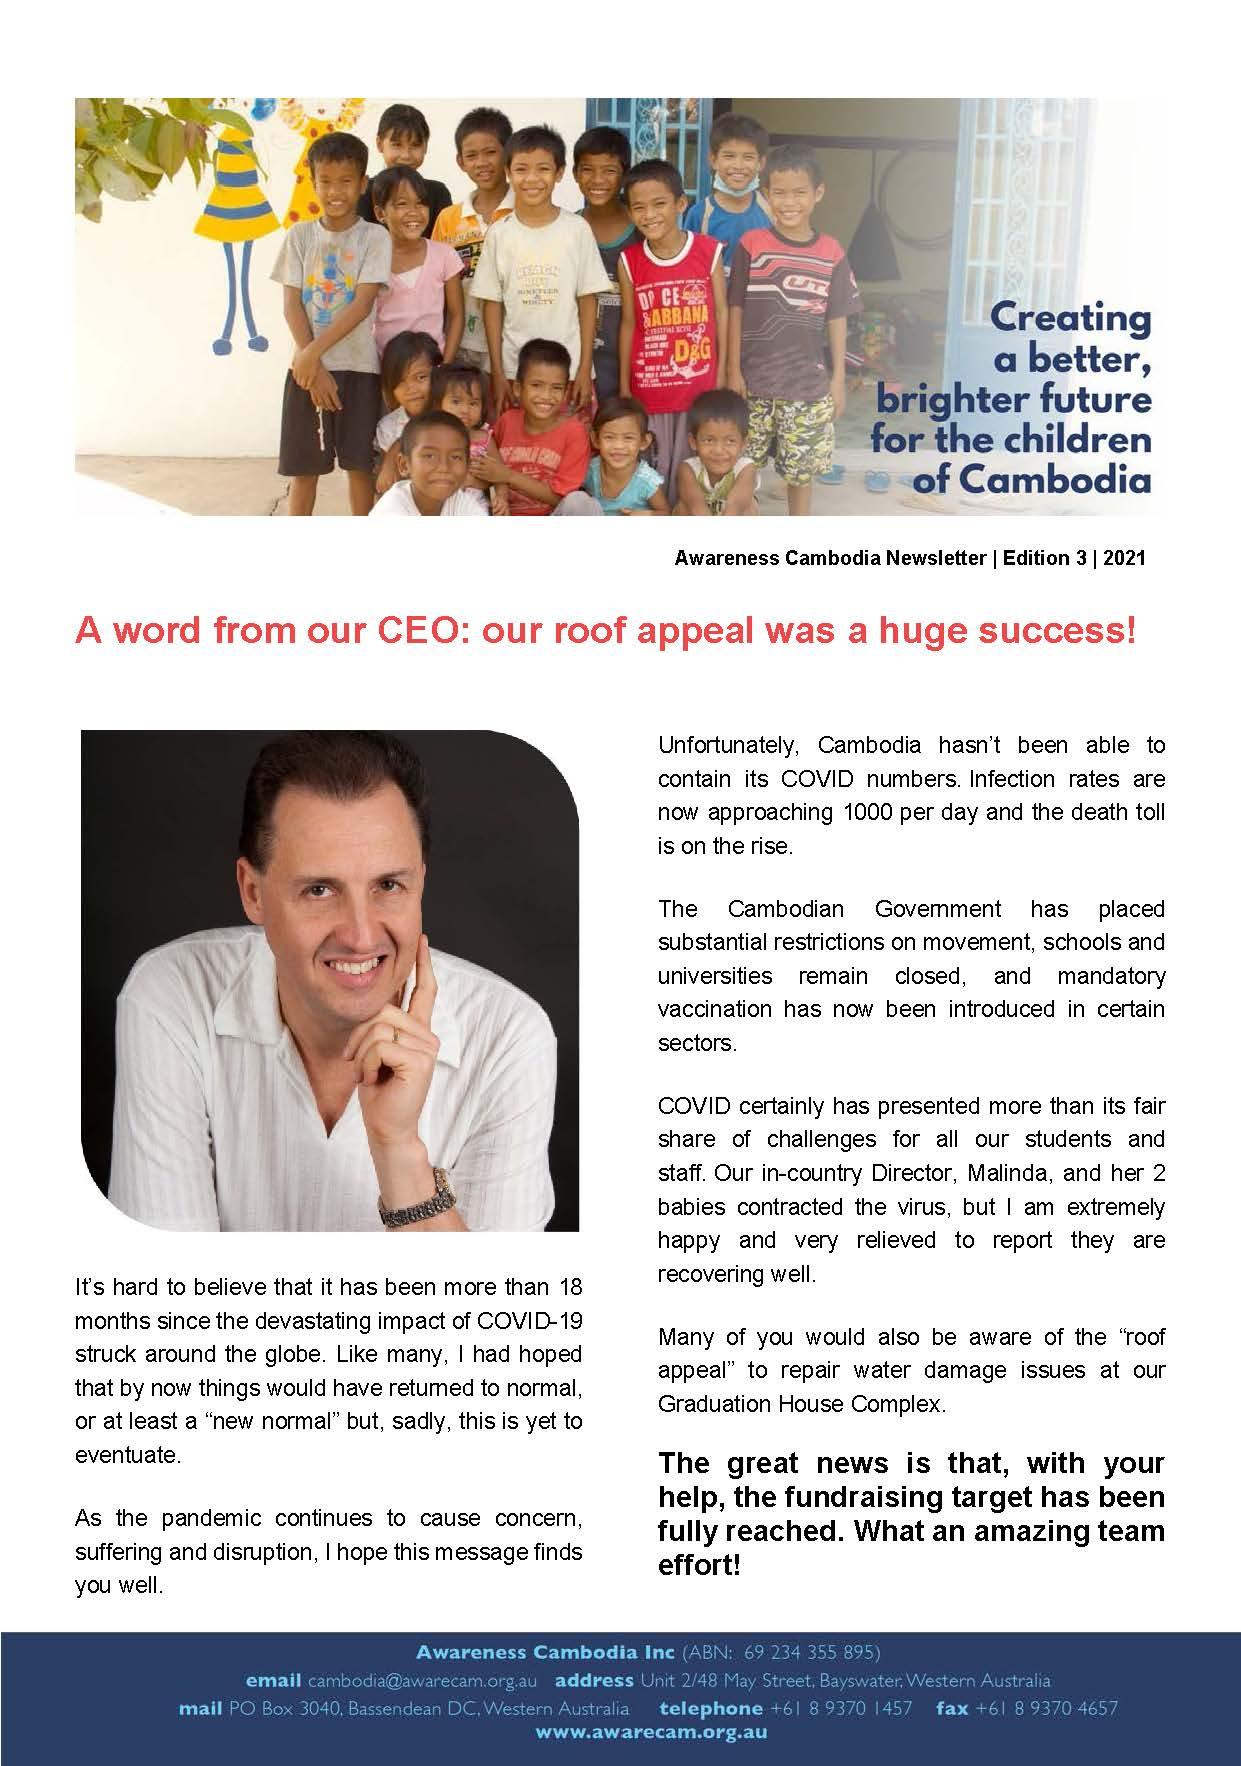 Awareness Cambodia - 2021 - Edition 3